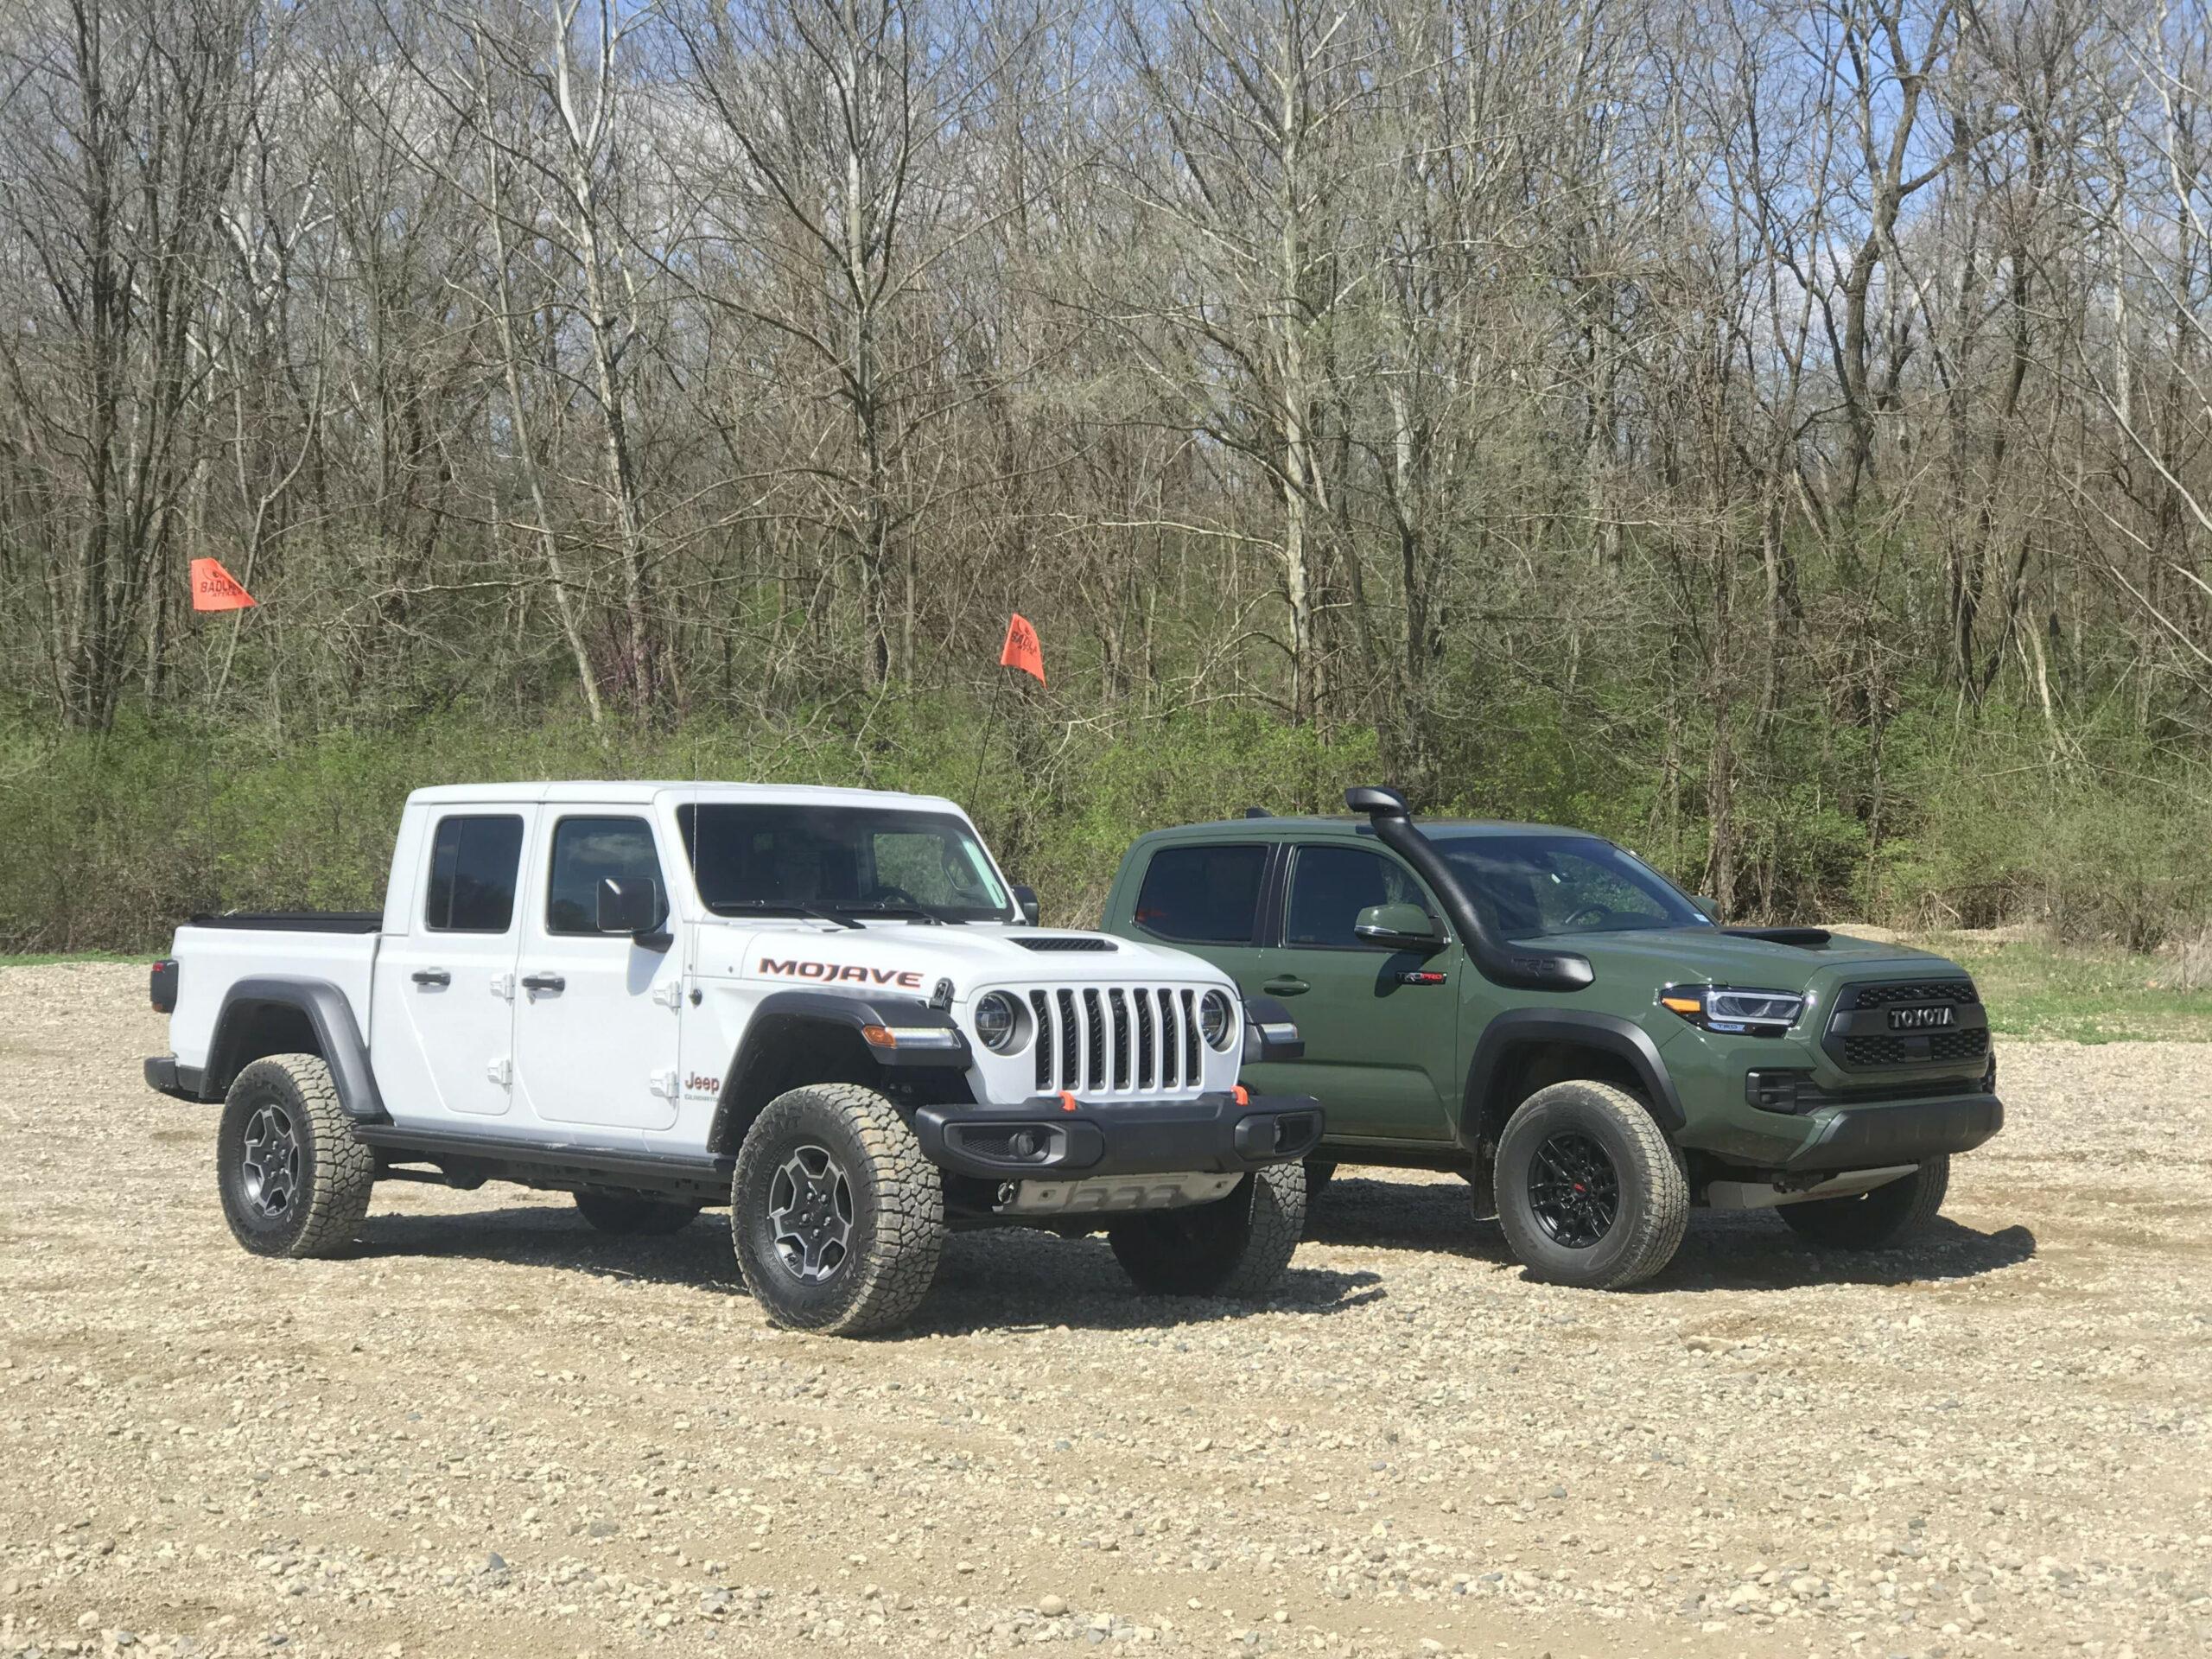 Release 2022 Jeep Gladiator Vs Tacoma